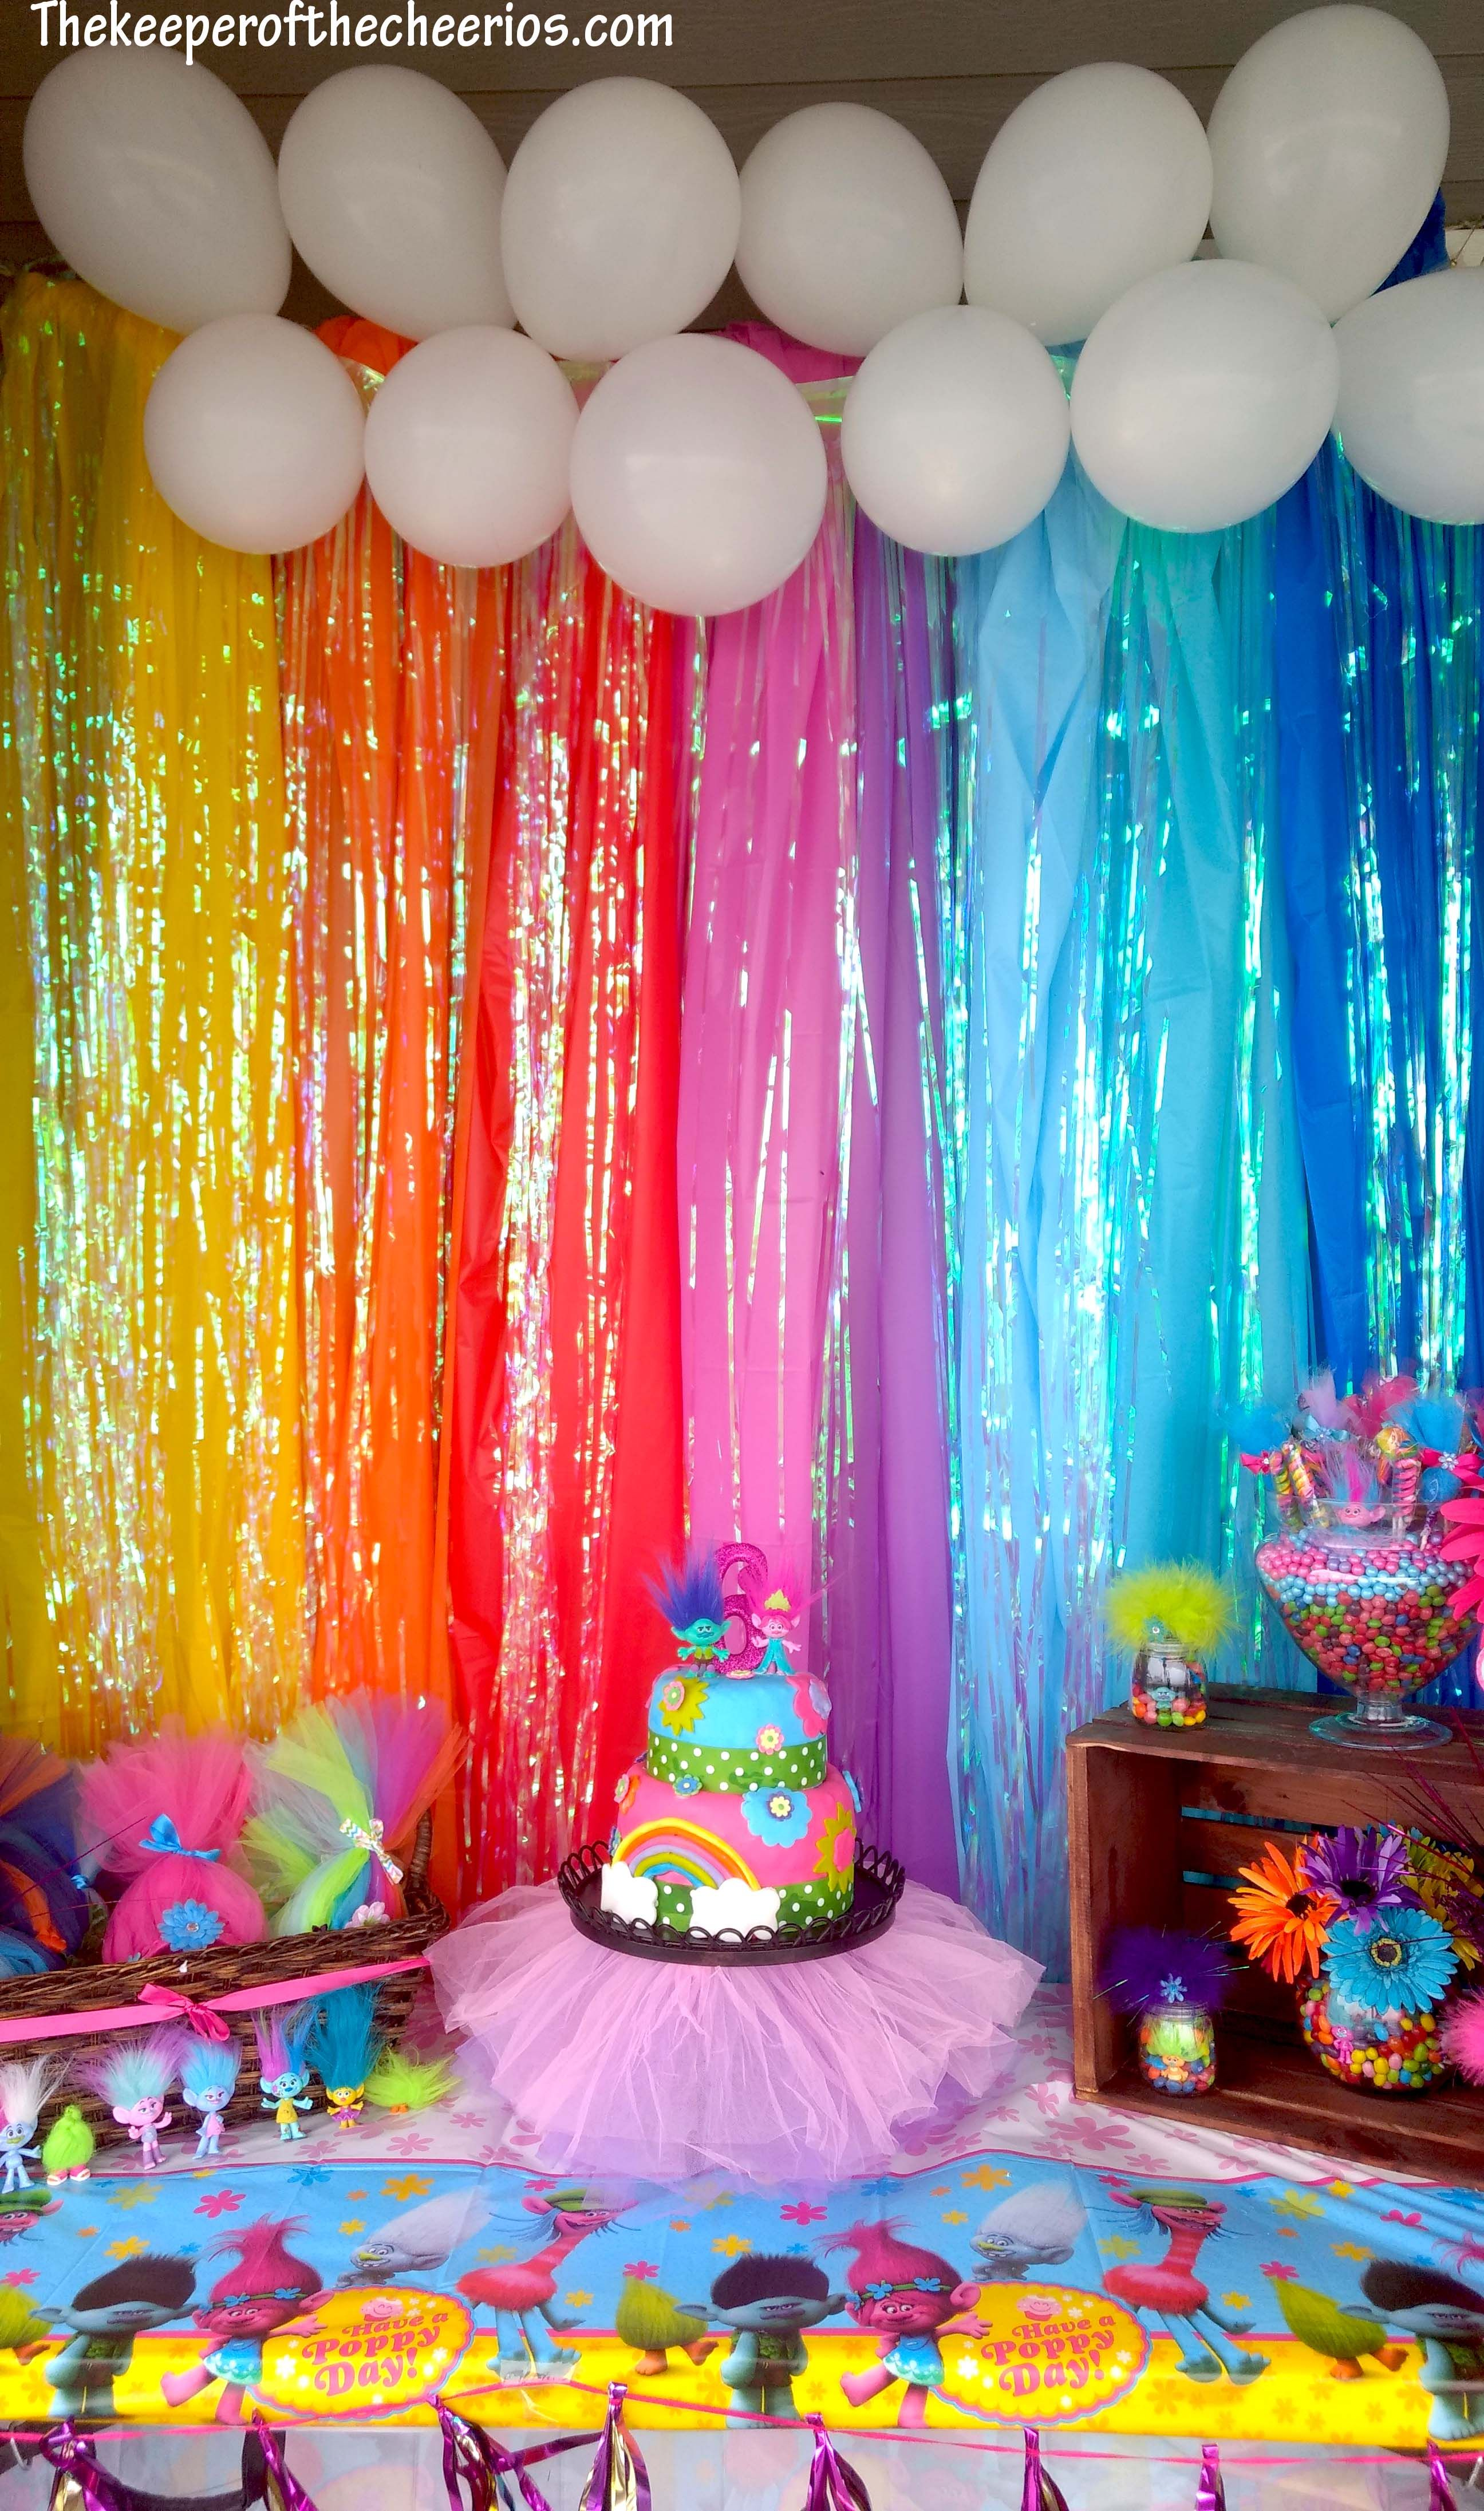 Hula Hoop Girl Wallpaper Trolls Birthday Party Parties Pinterest Trolls